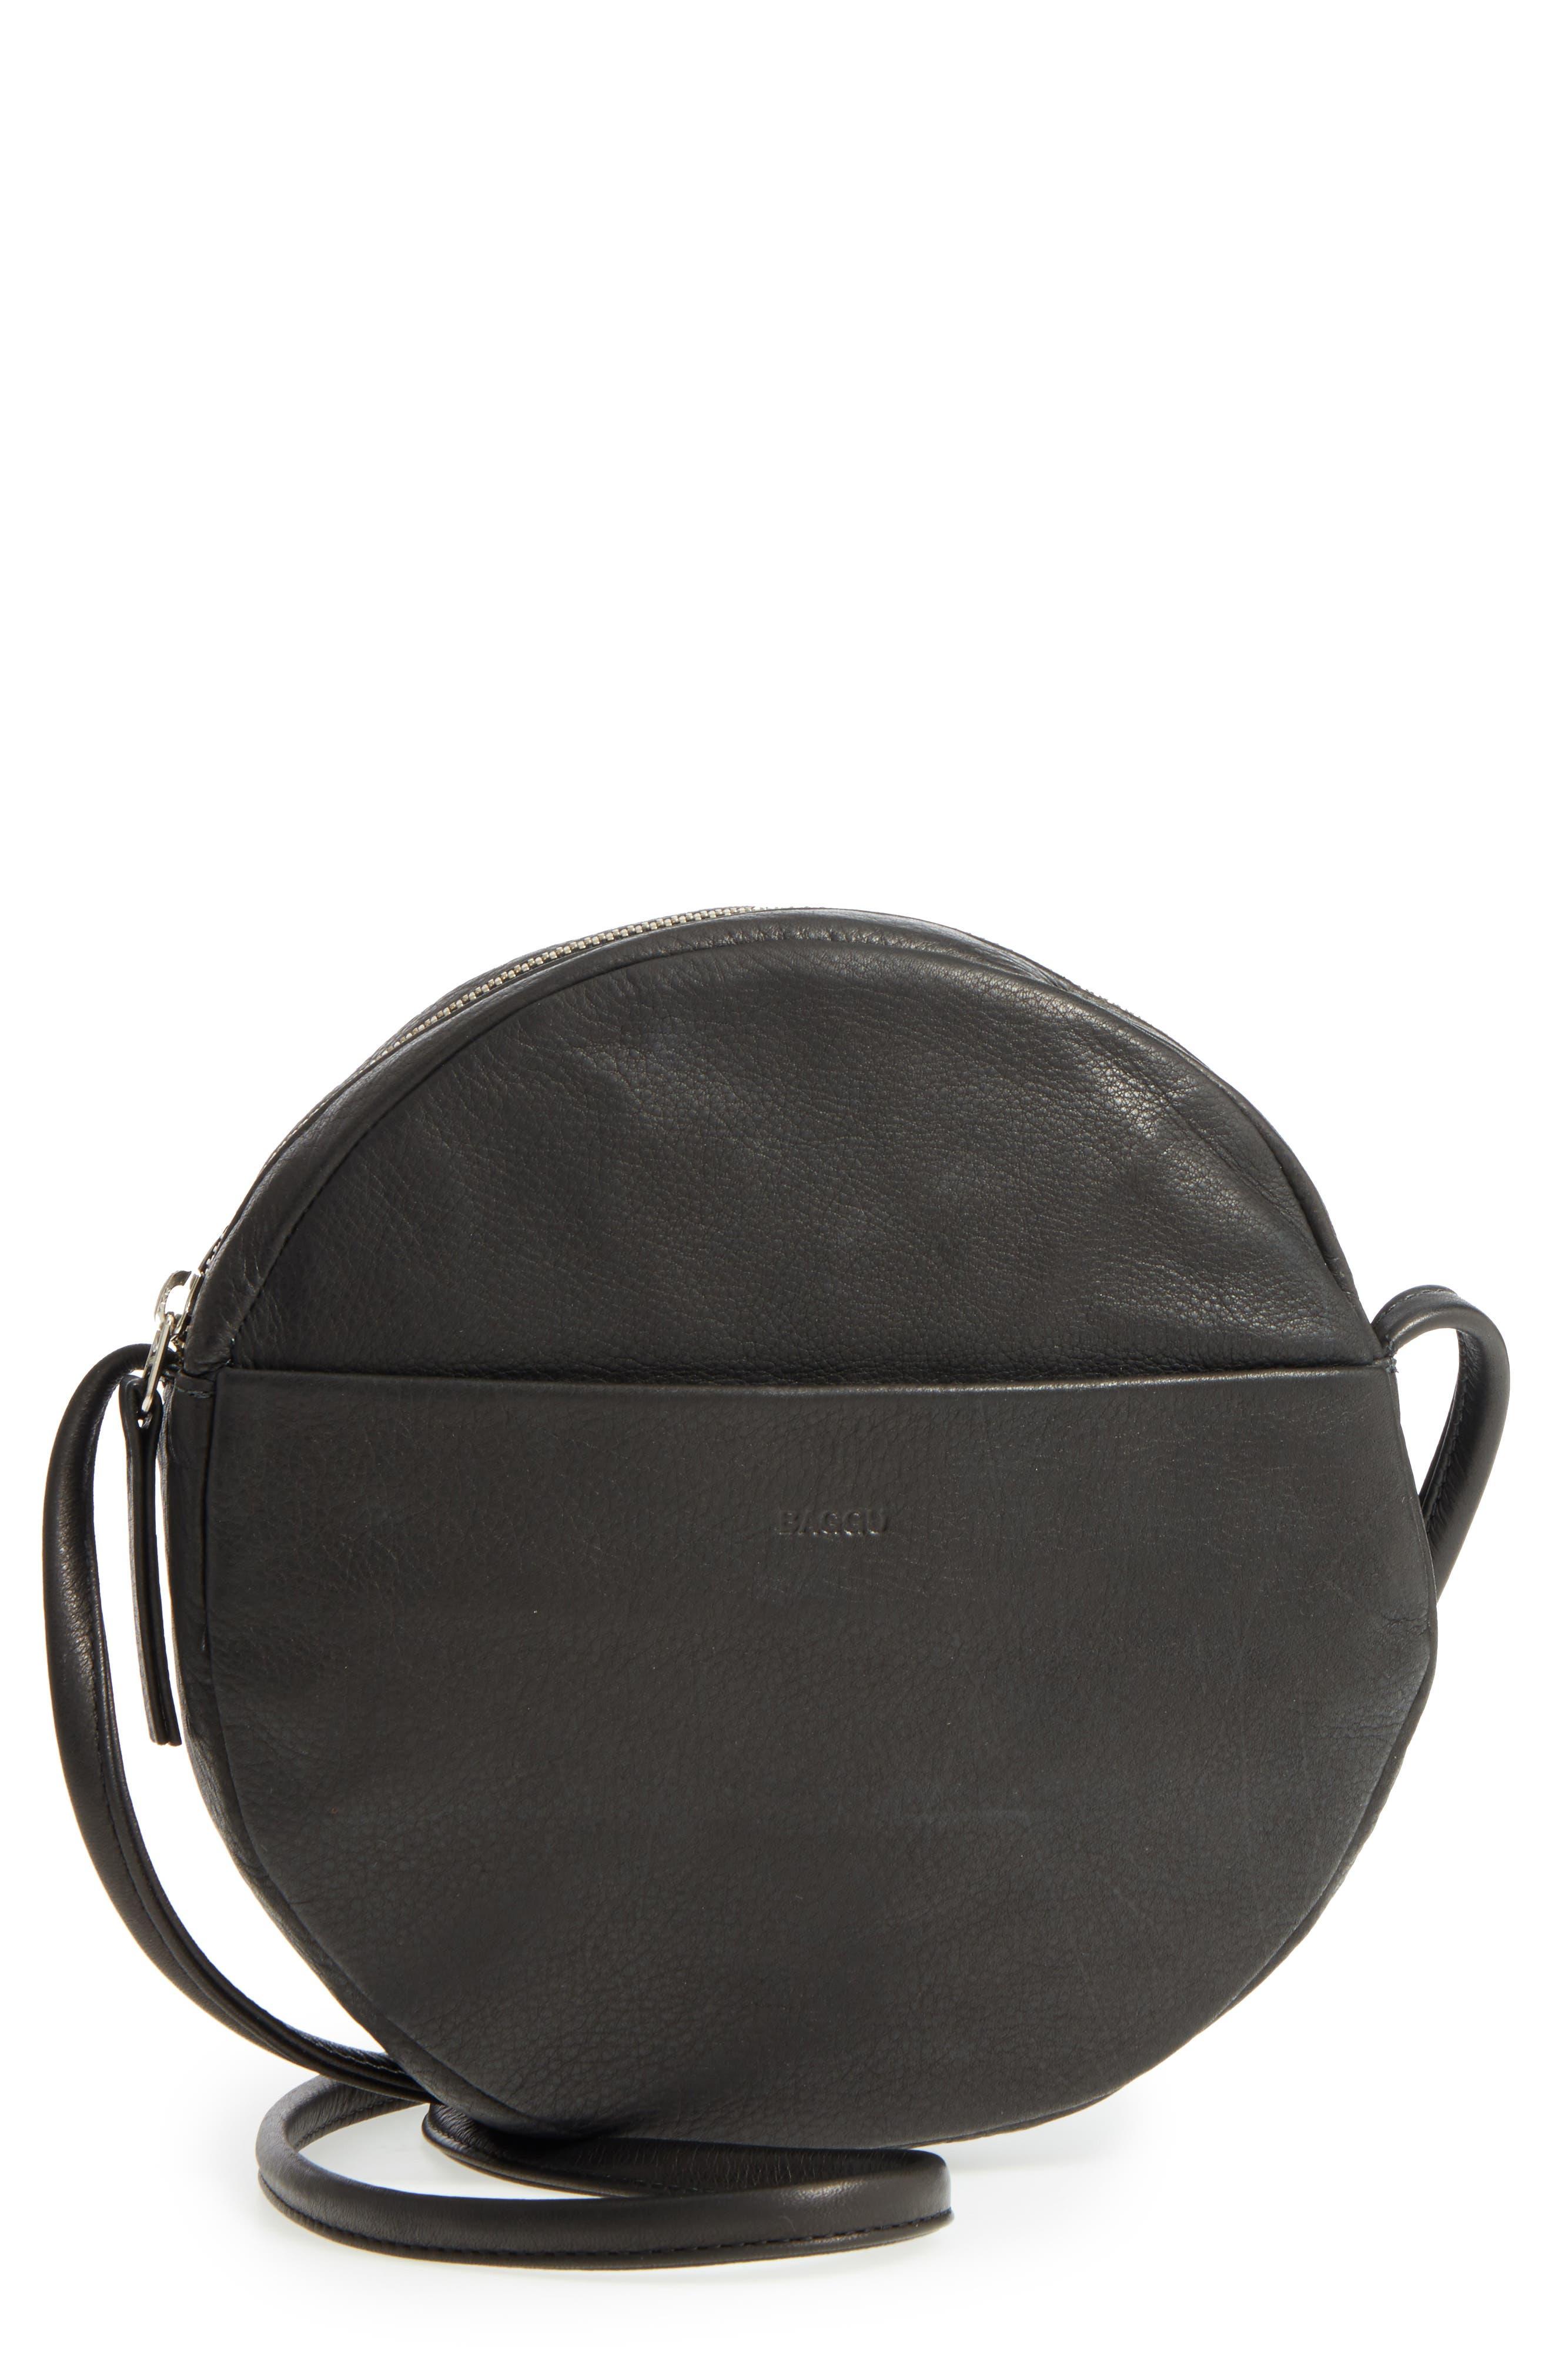 Circle Calfskin Leather Crossbody Bag,                         Main,                         color,